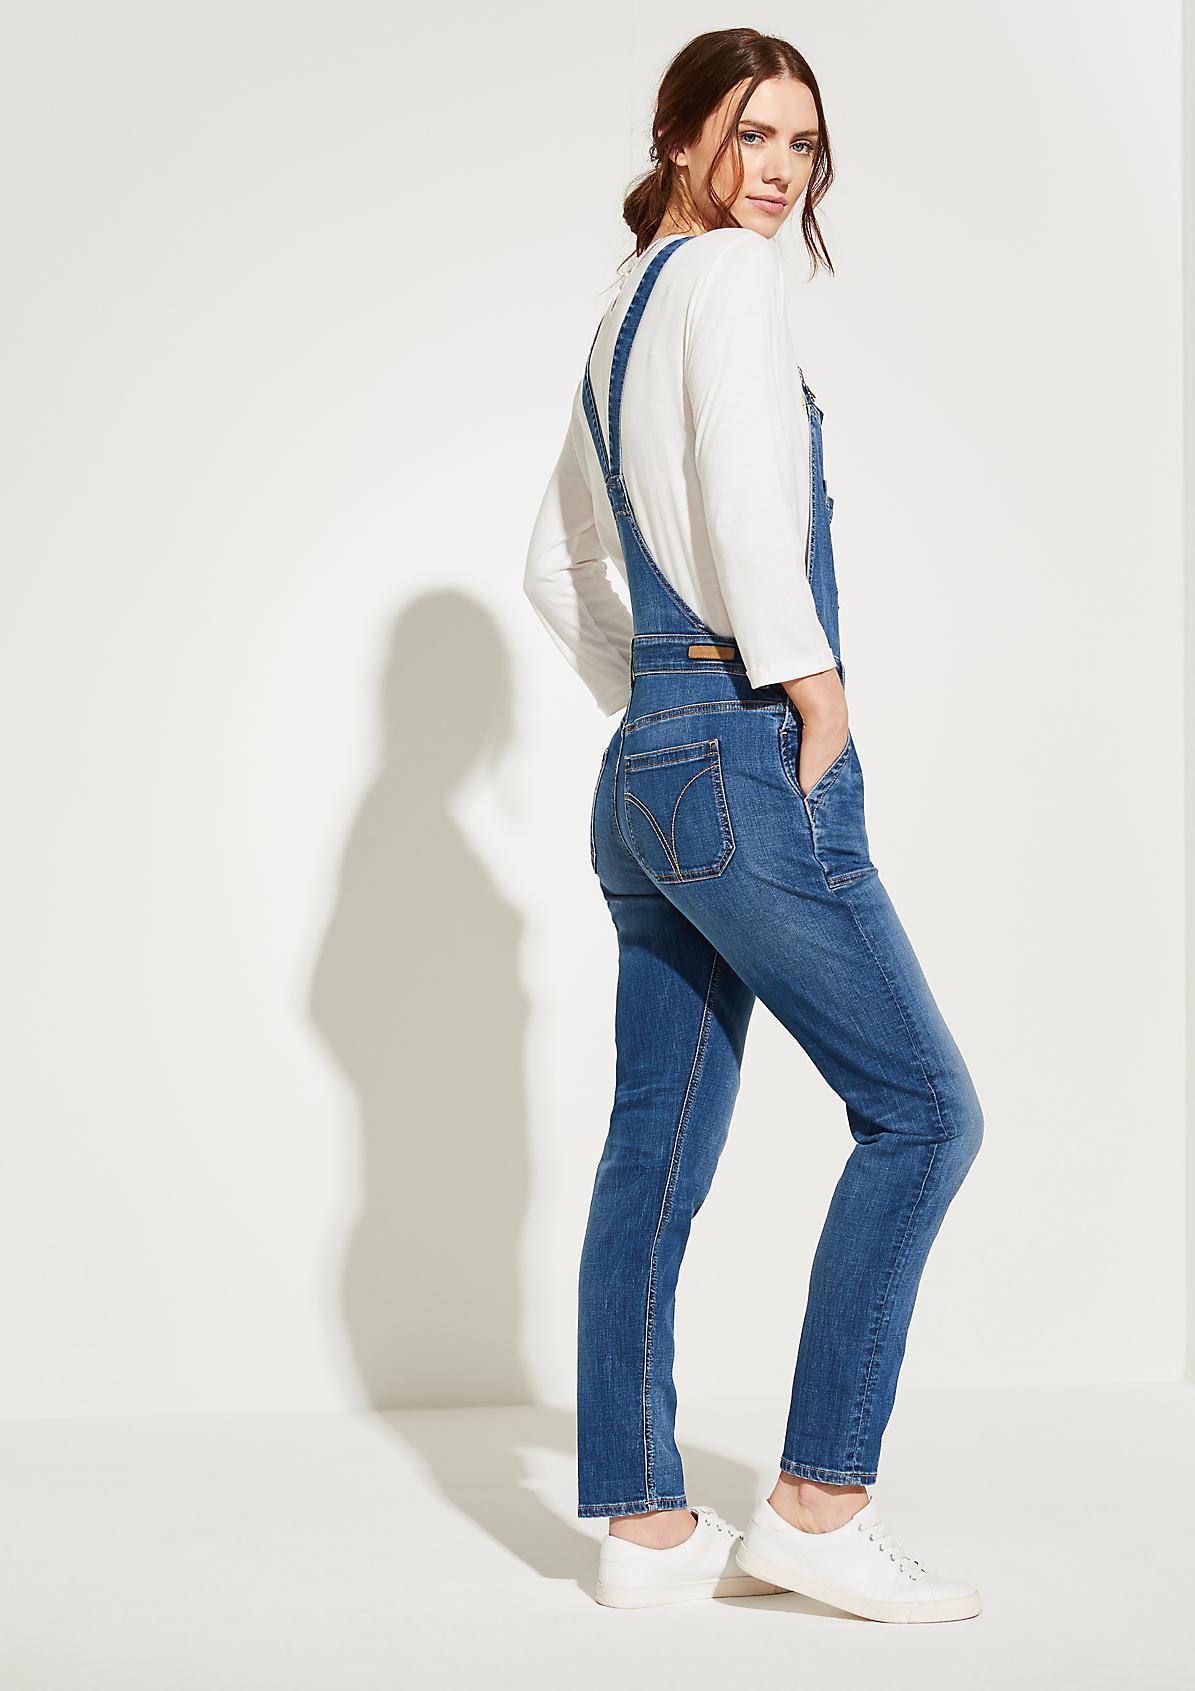 Latzhose aus Jeansstoff